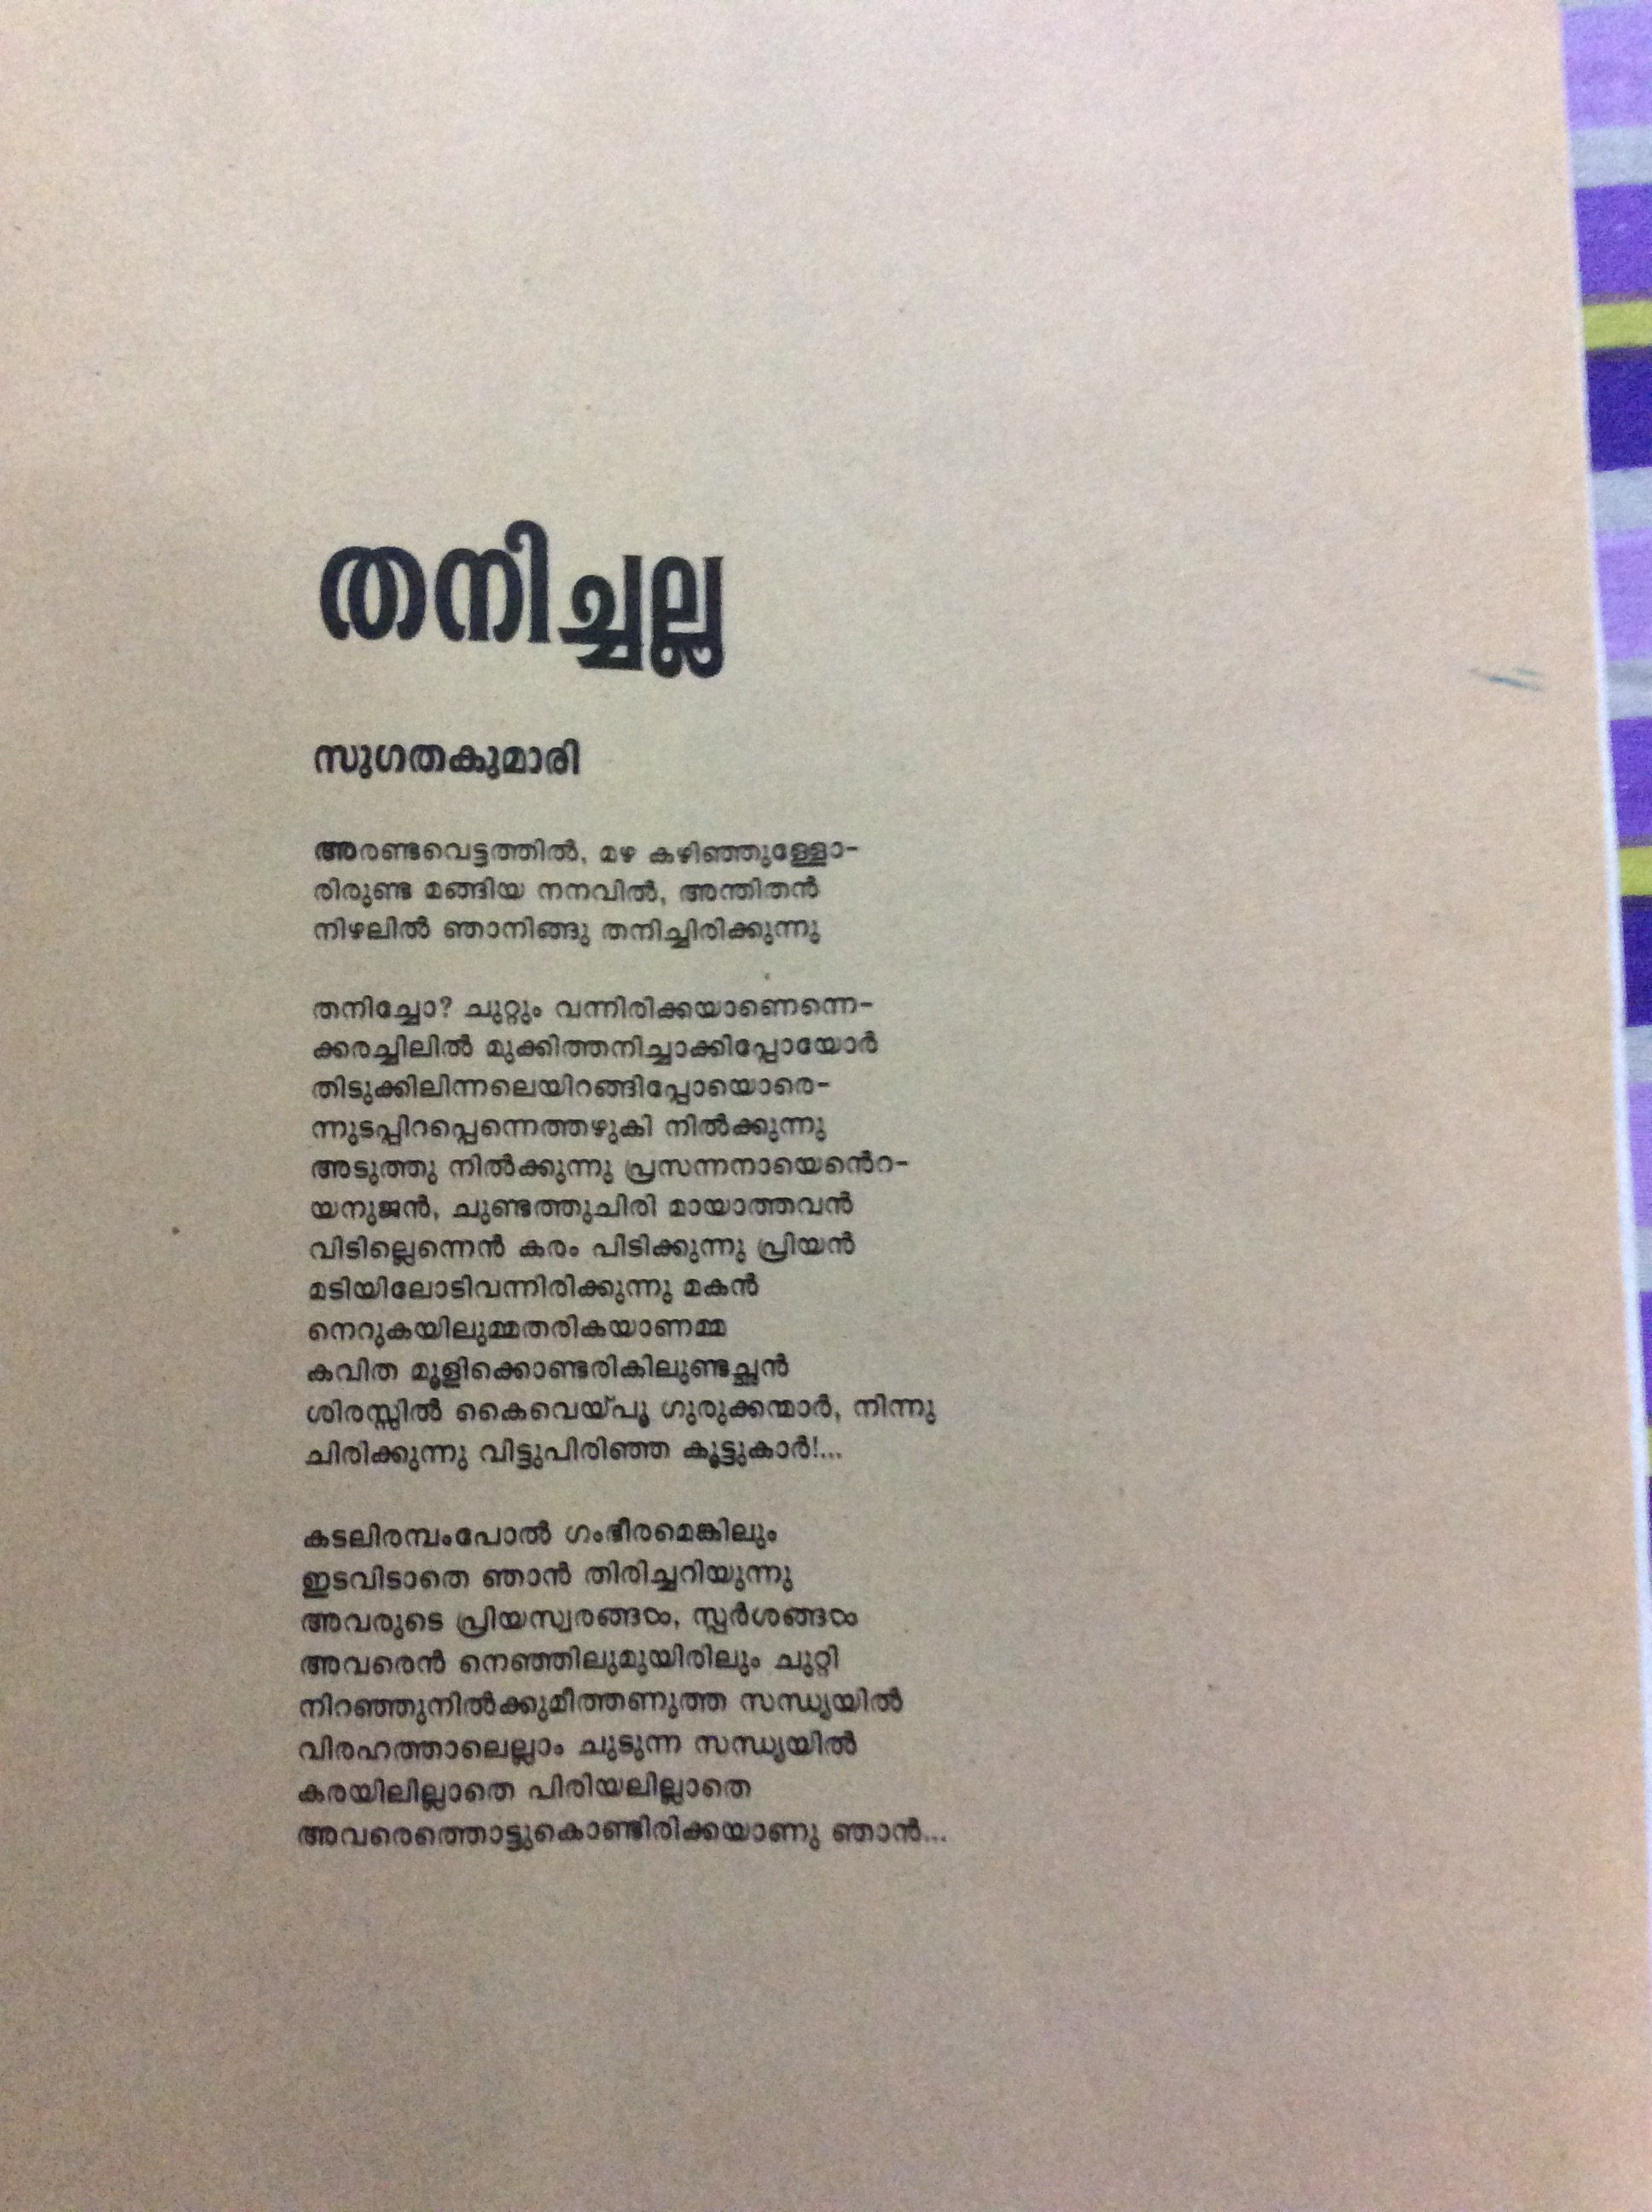 Not Alone Thanichalla Sugata Kumary Poem Ministhy S Nair